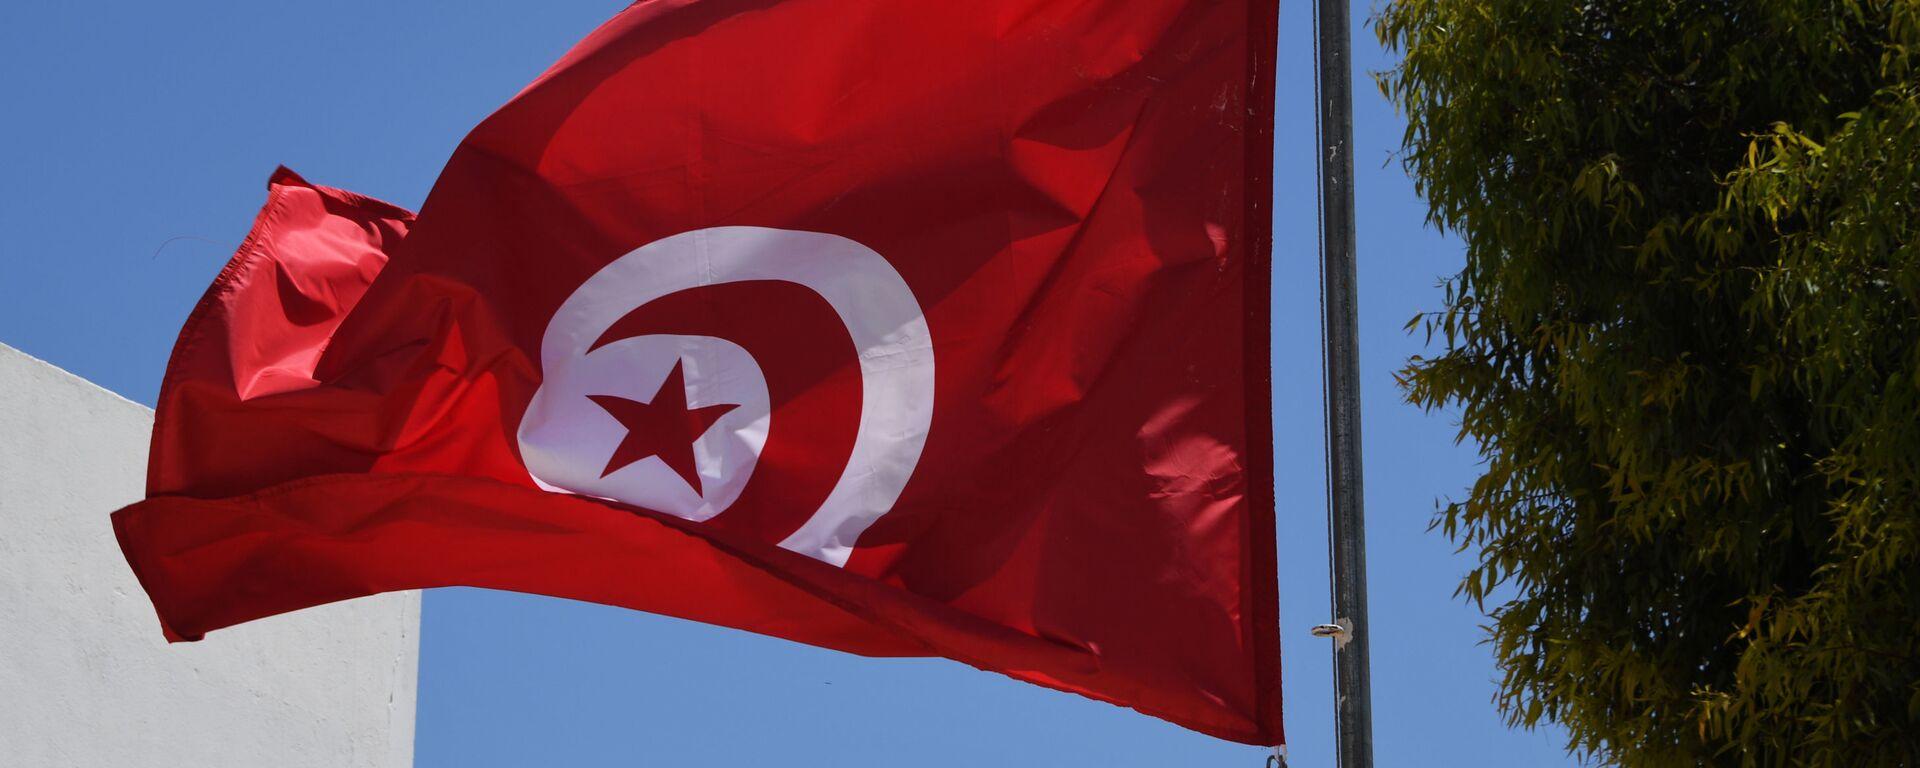 Drapeau de la Tunisie - Sputnik France, 1920, 04.06.2021